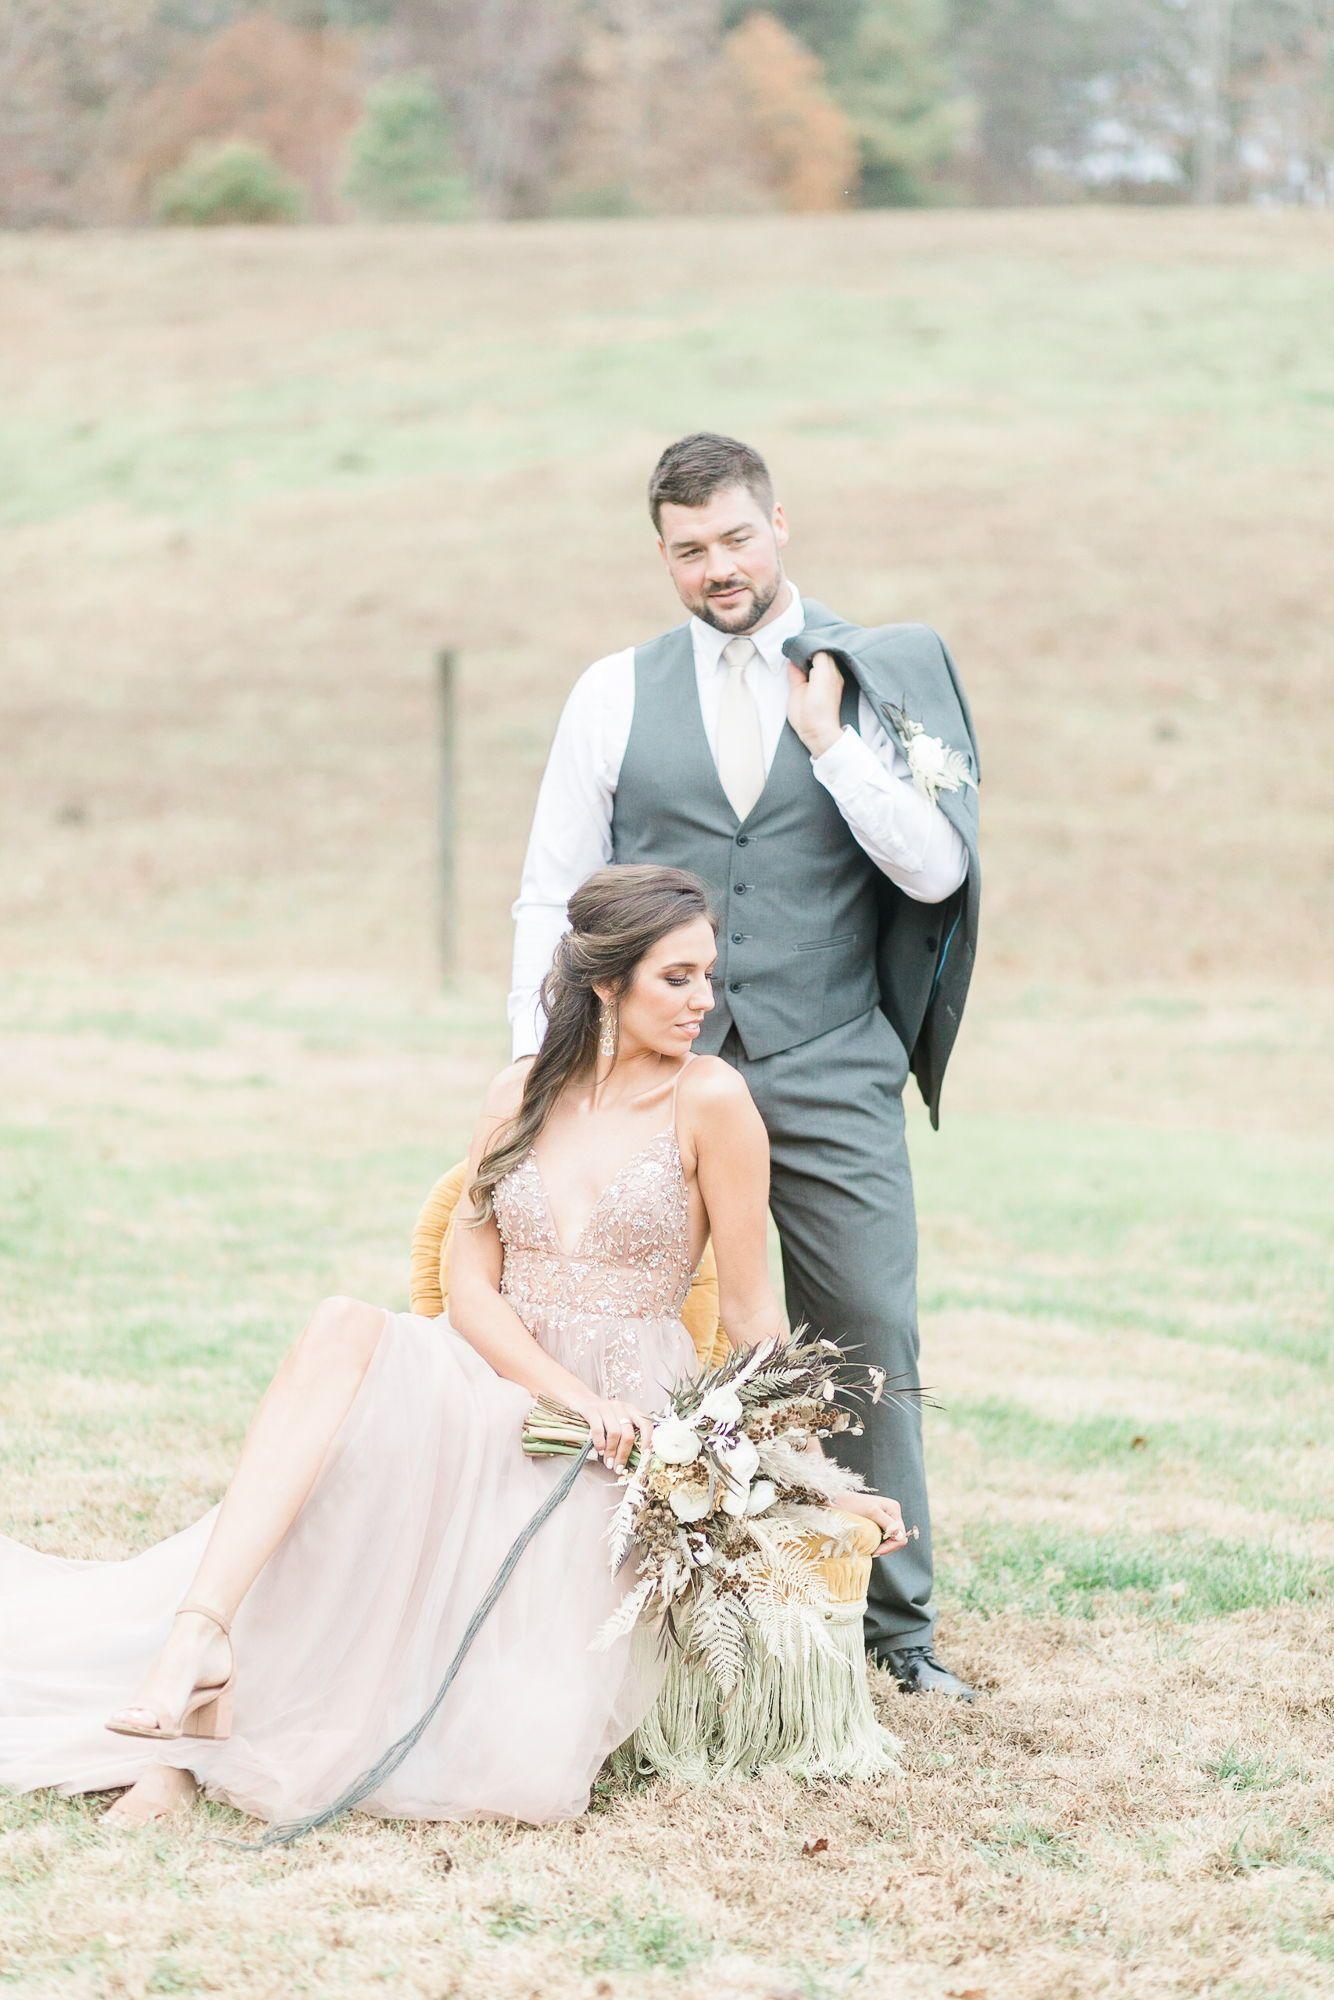 Modern Bohemian Wedding Inspiration At The Pointe At Lake Hickory In 2020 Bohemian Wedding Inspiration Nc Wedding Venue Boho Wedding Inspiration